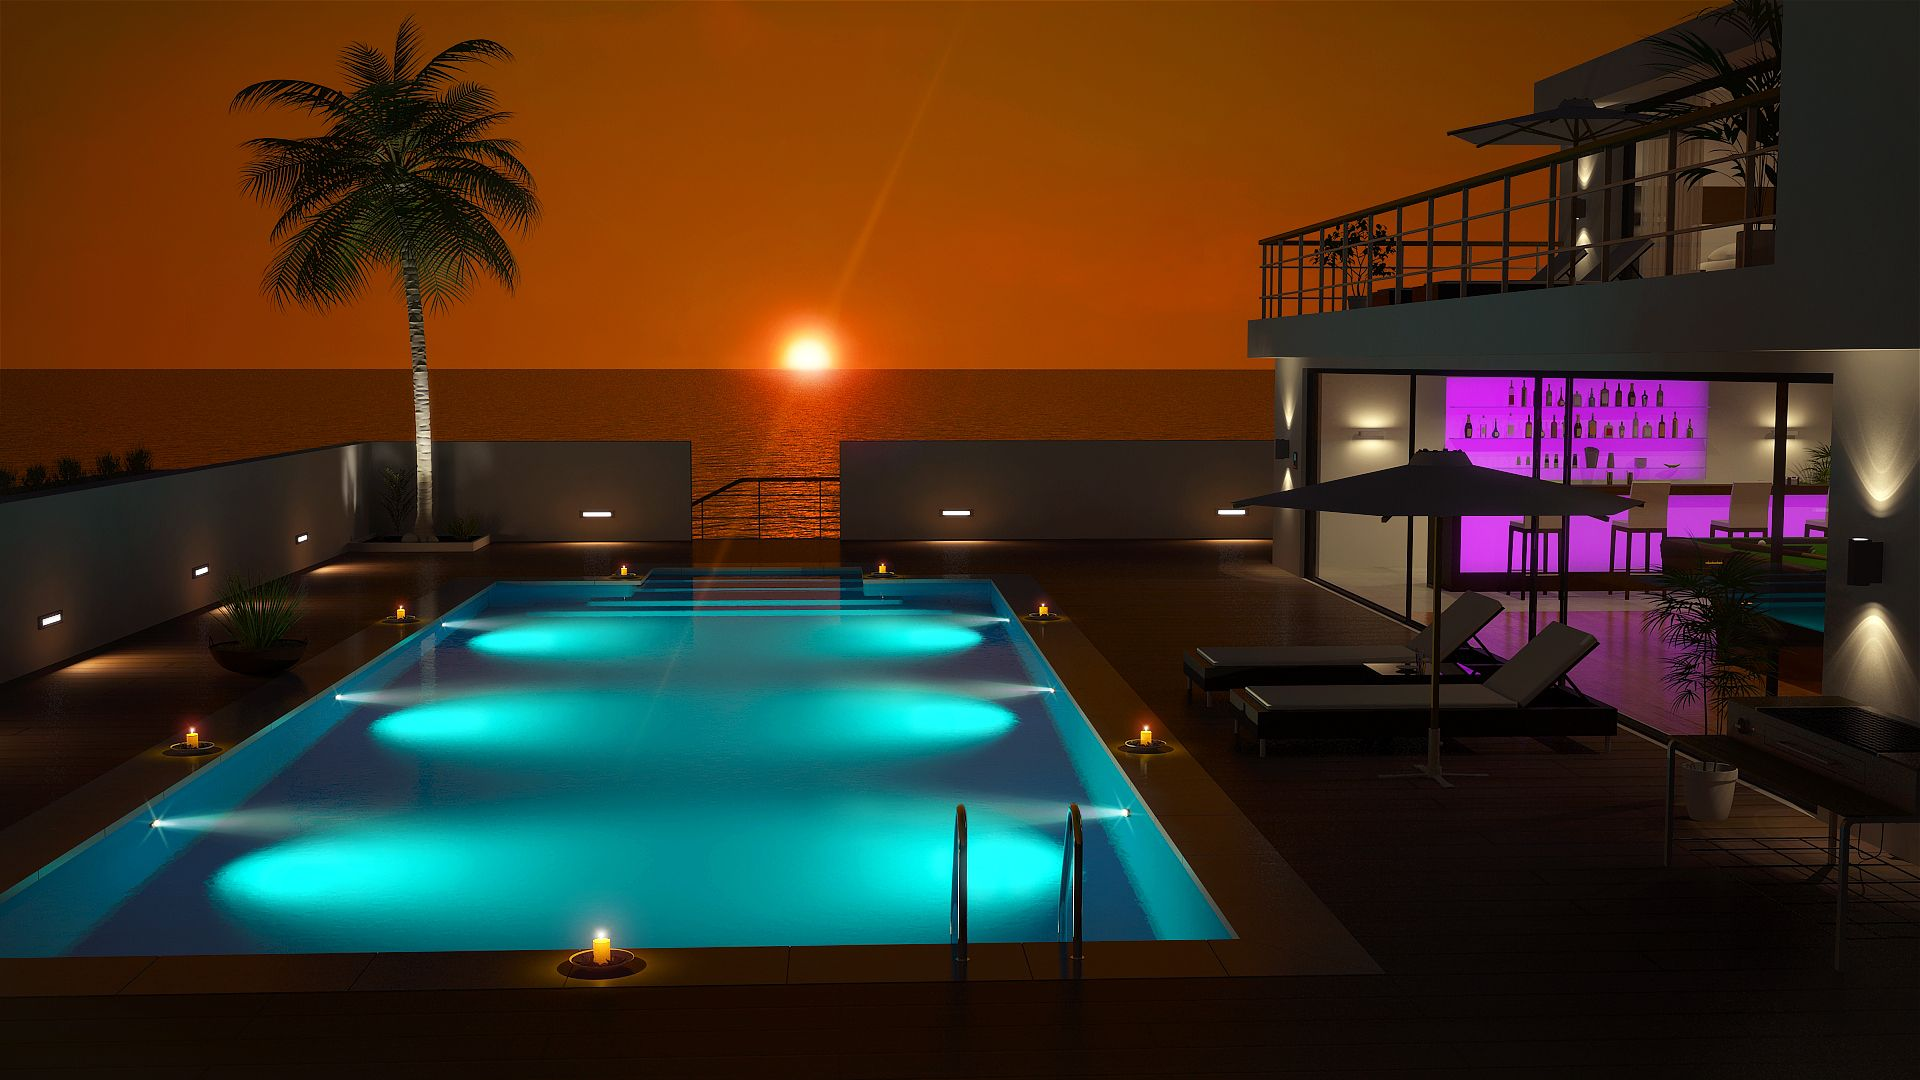 16 Luxury Pubg Wallpaper Iphone 6: Beach House Wallpaper